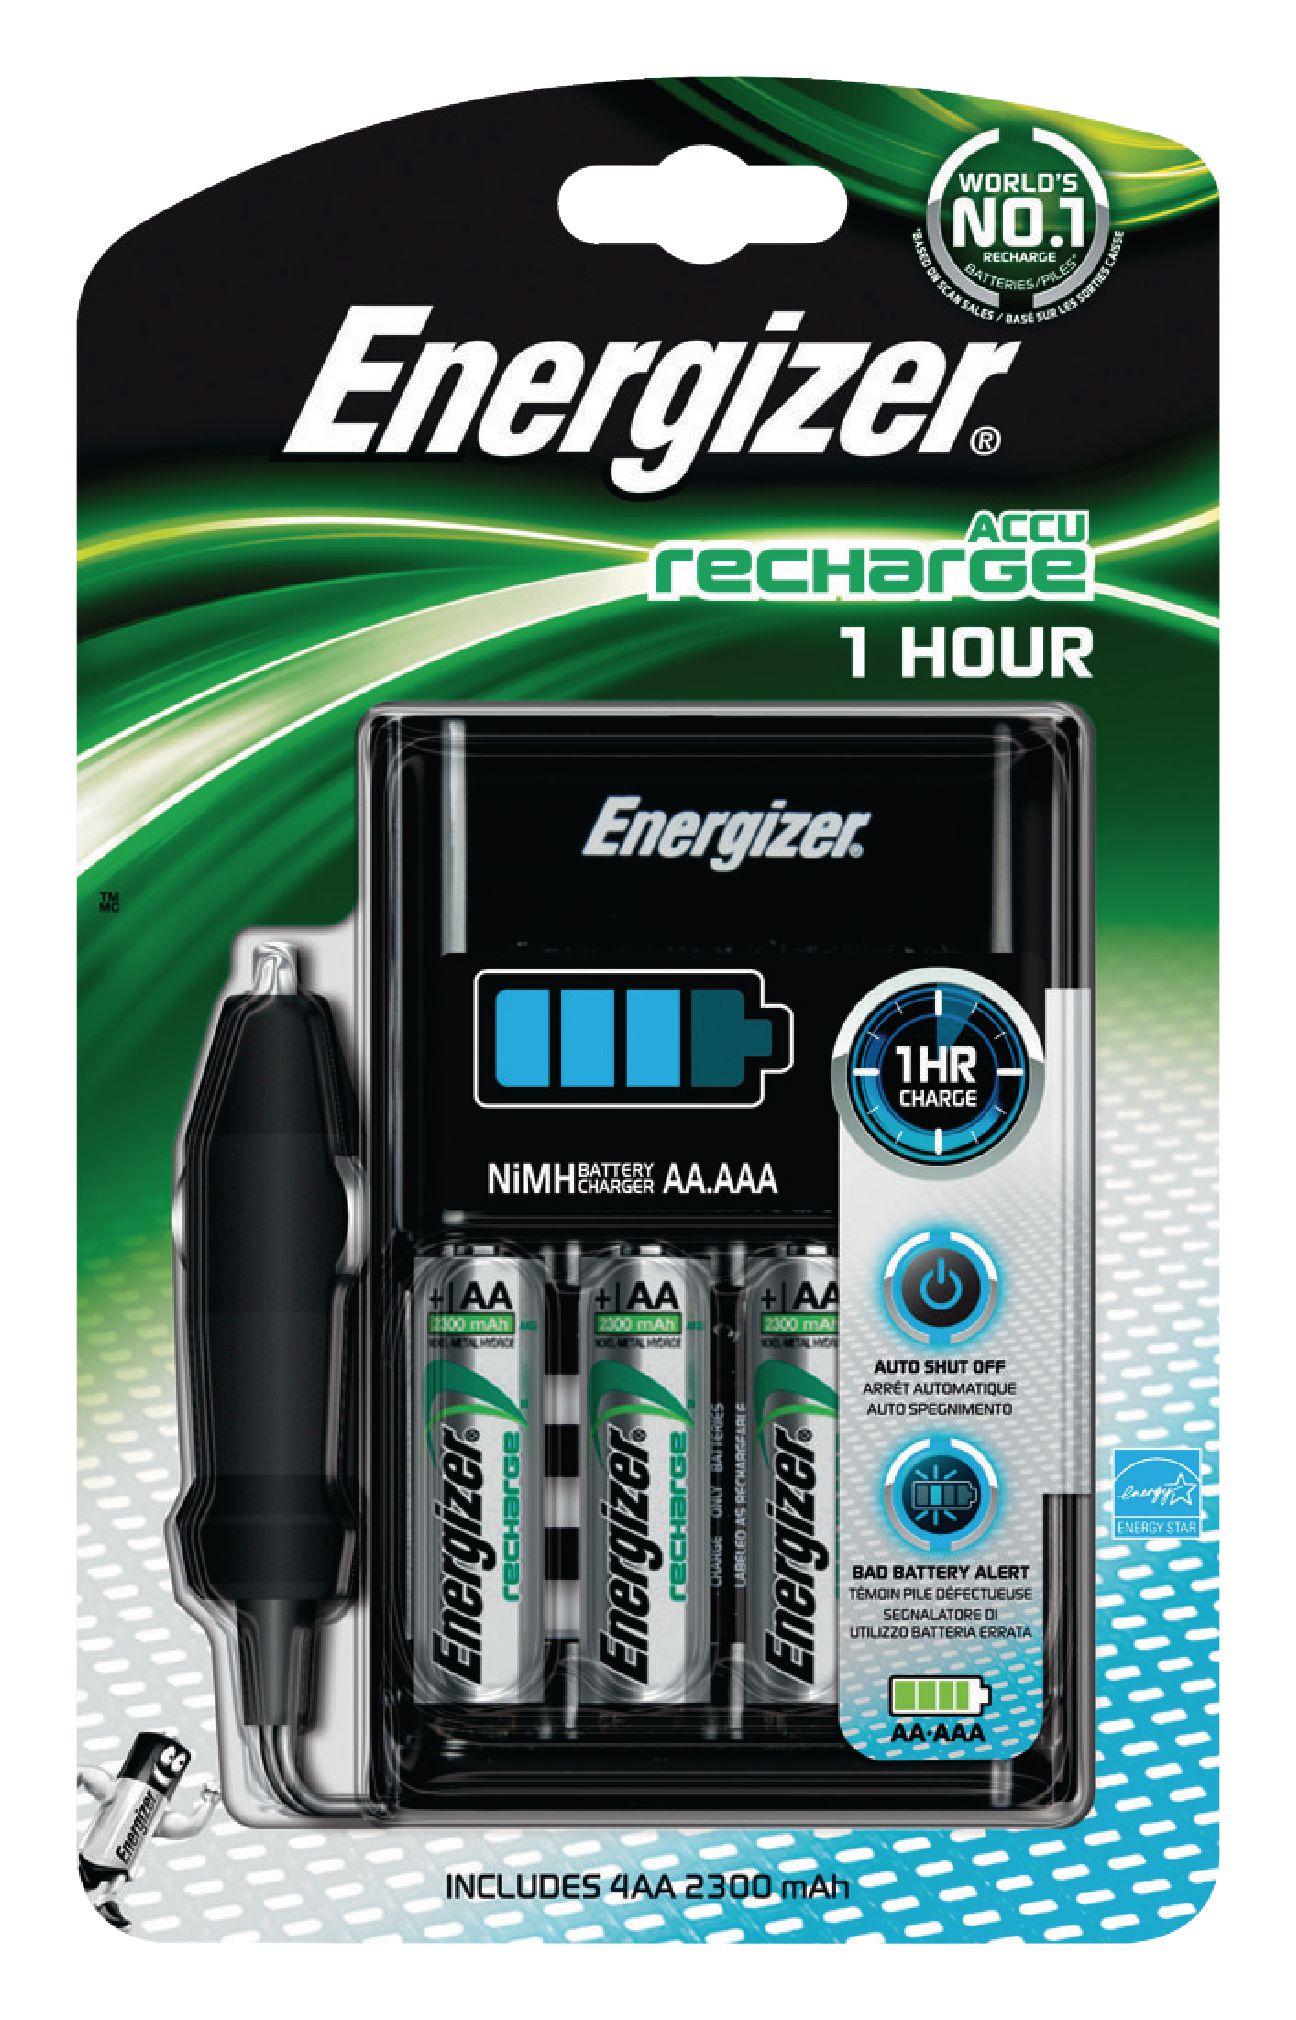 Nabíječka NiMH baterií + 4x AA/HR6 2300 mAh Energizer 1 Hour Charger EN-638893